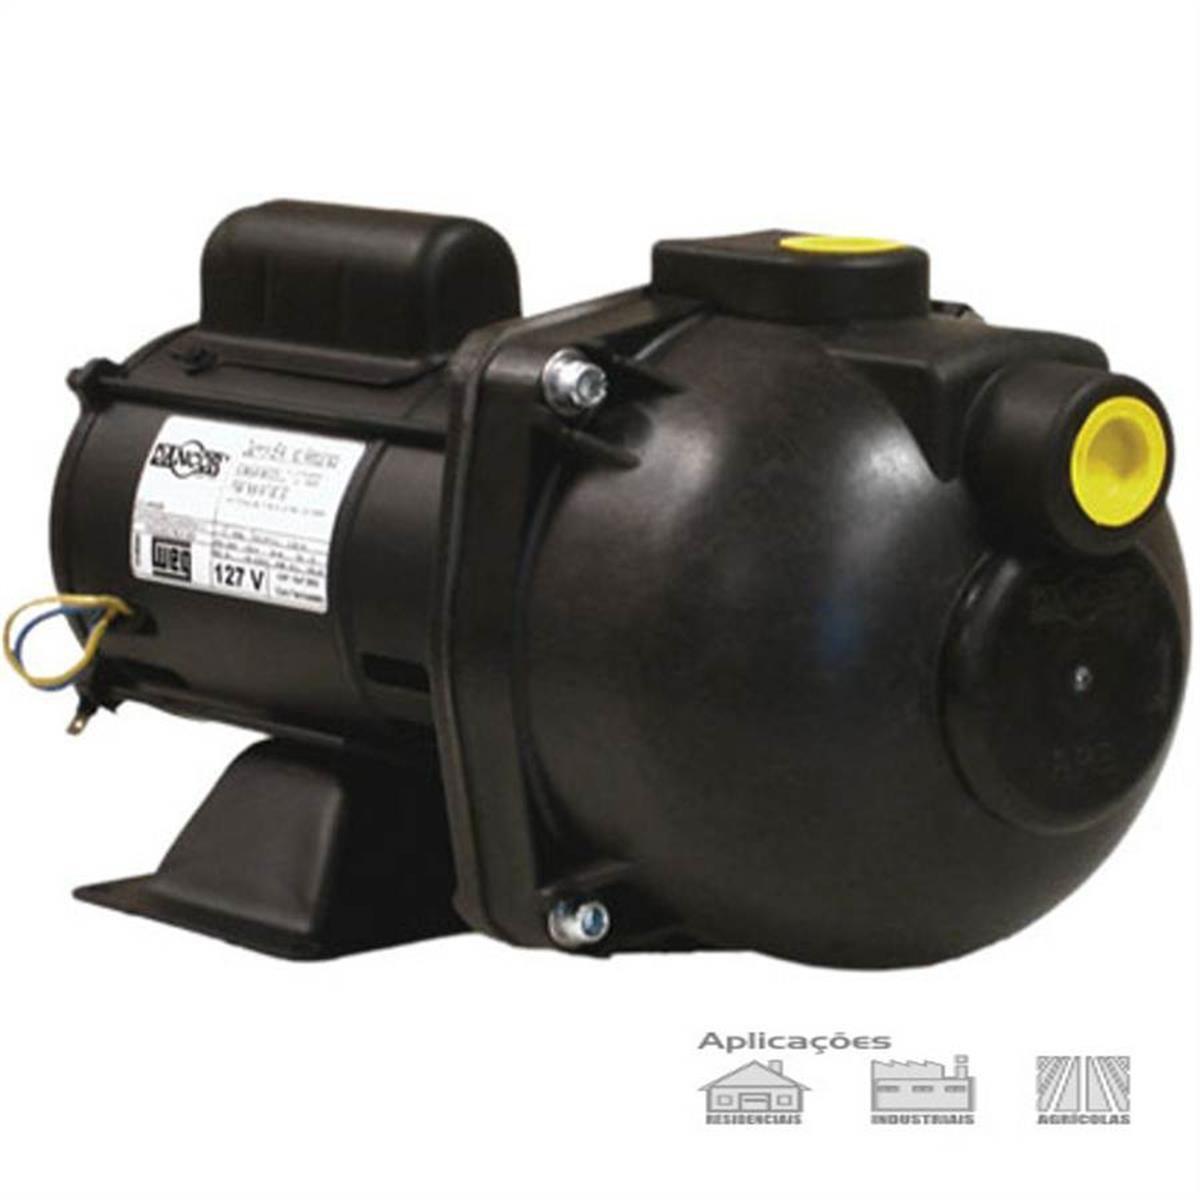 Bomba Autoaspirante Dancor Ap-3c (77) 3/4 cv monofásica 110/220v